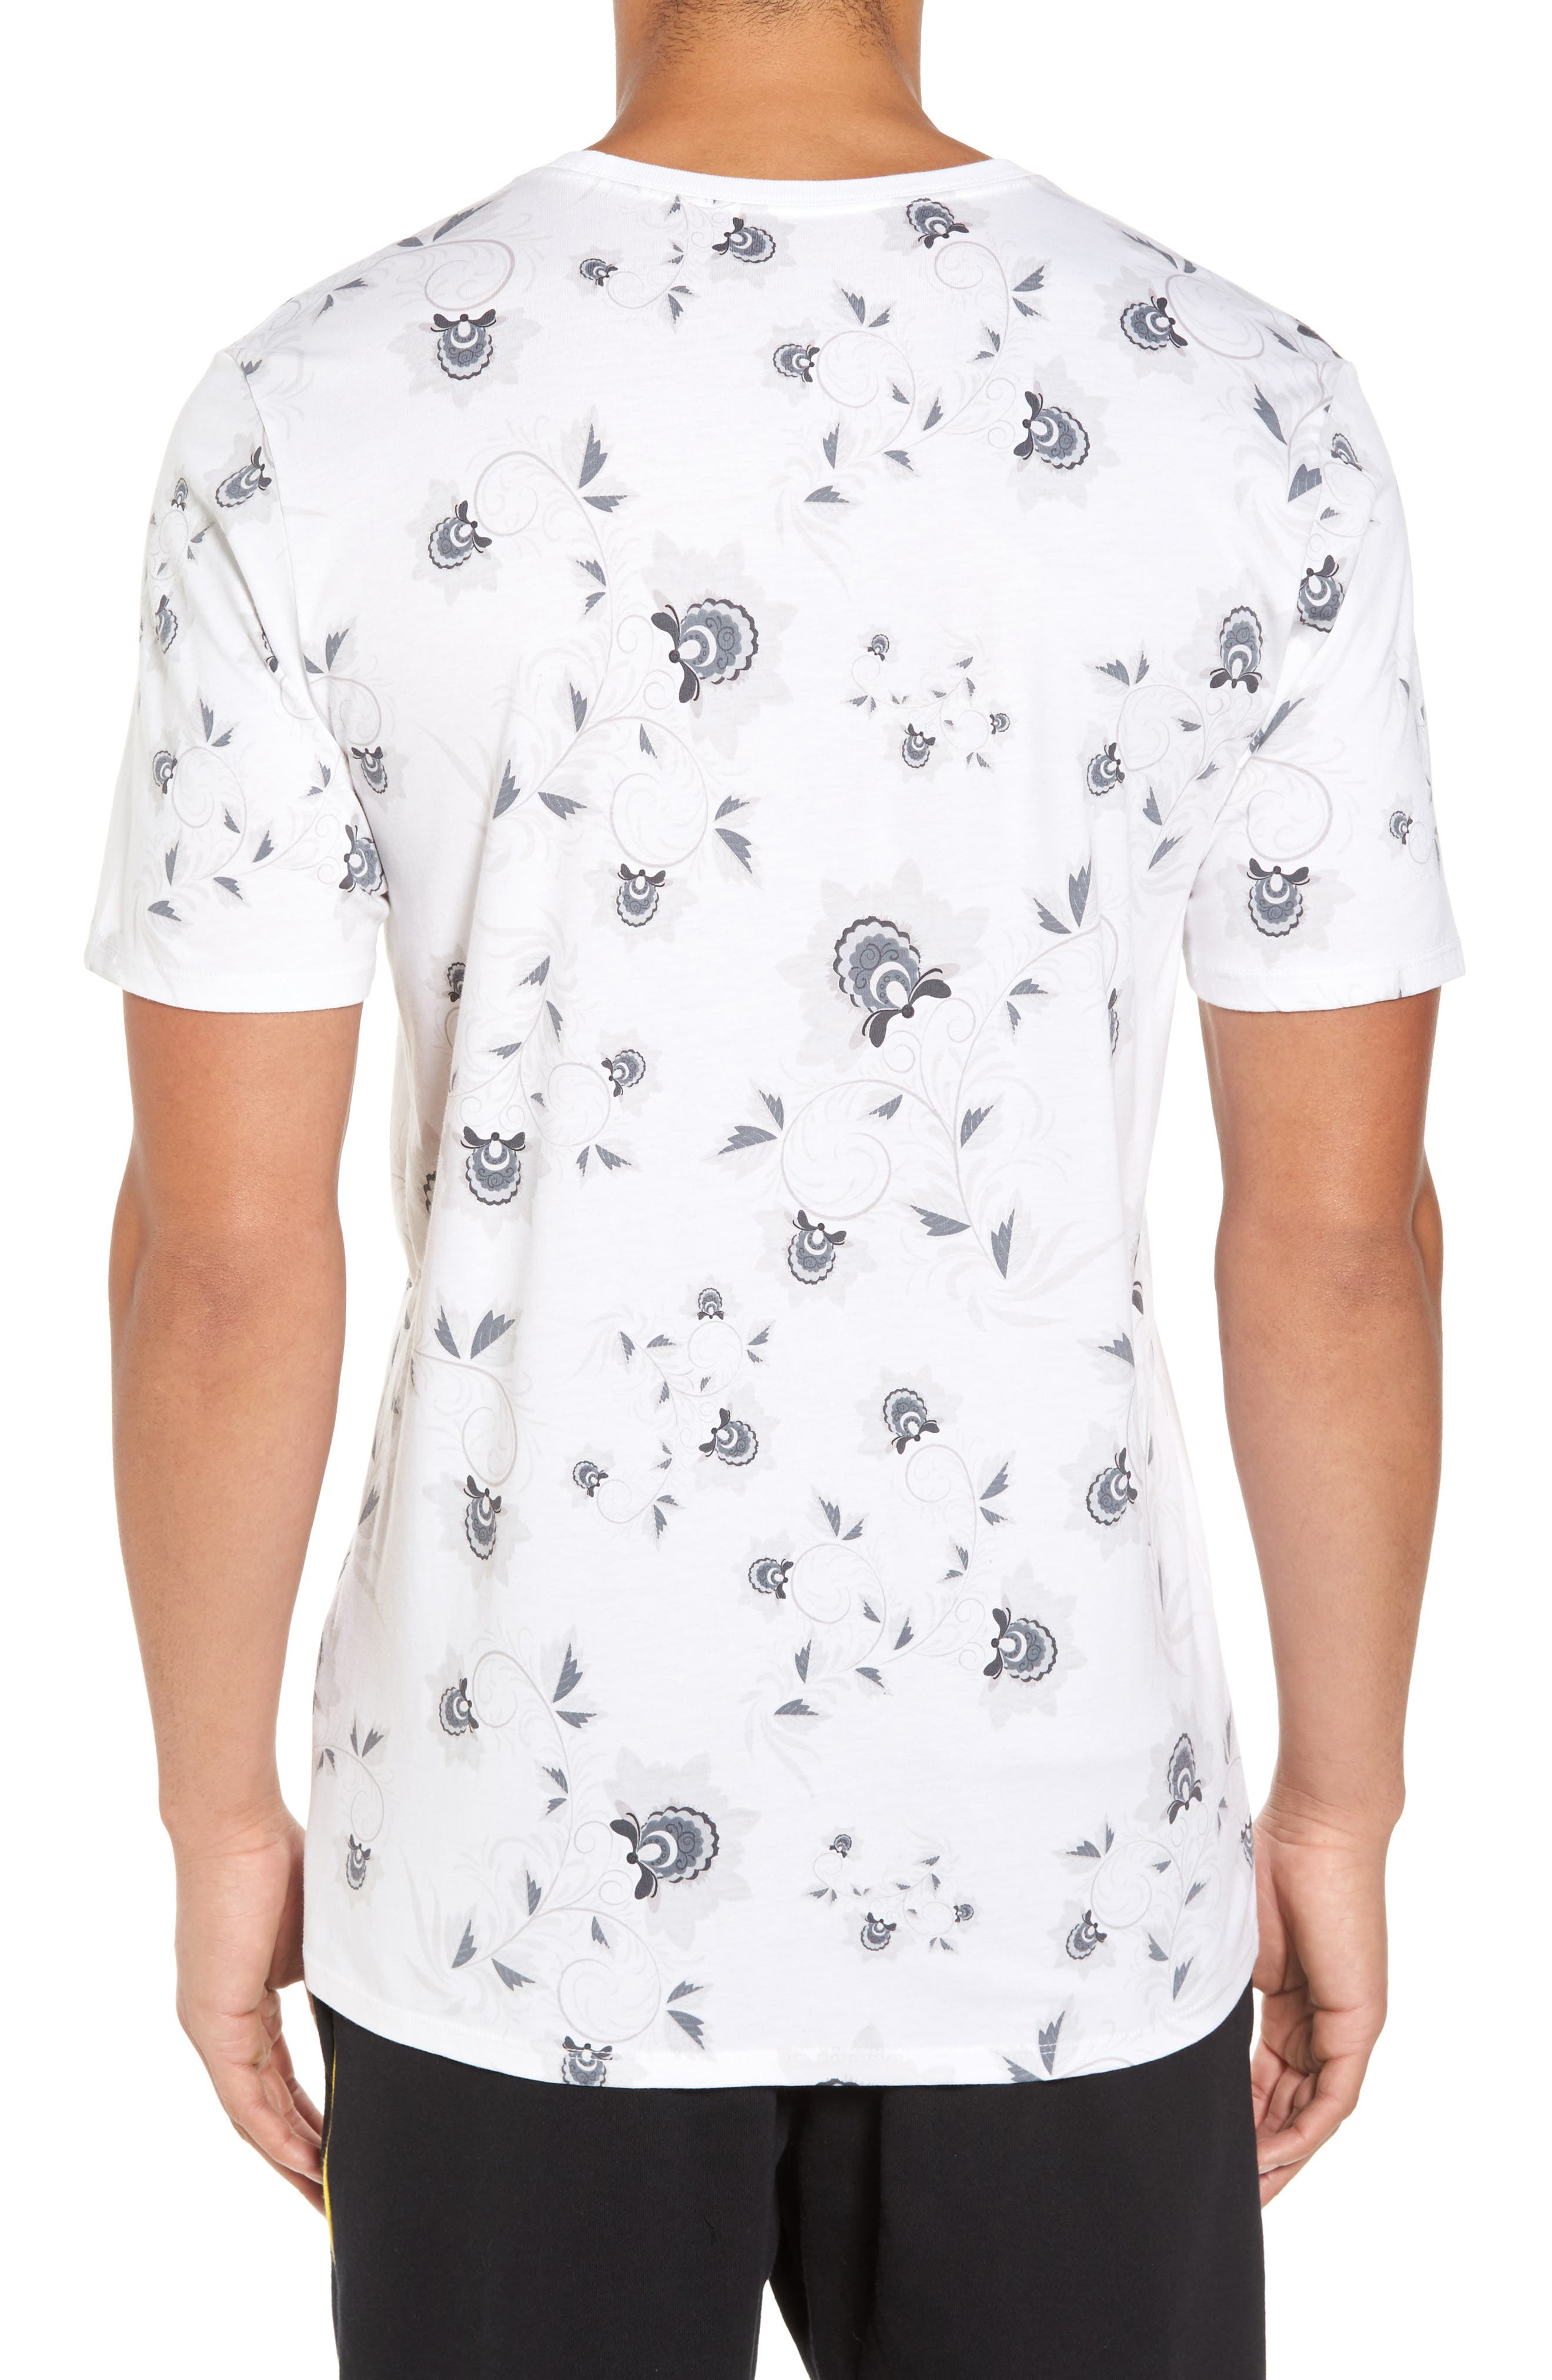 NSW Concept T-Shirt,                             Alternate thumbnail 6, color,